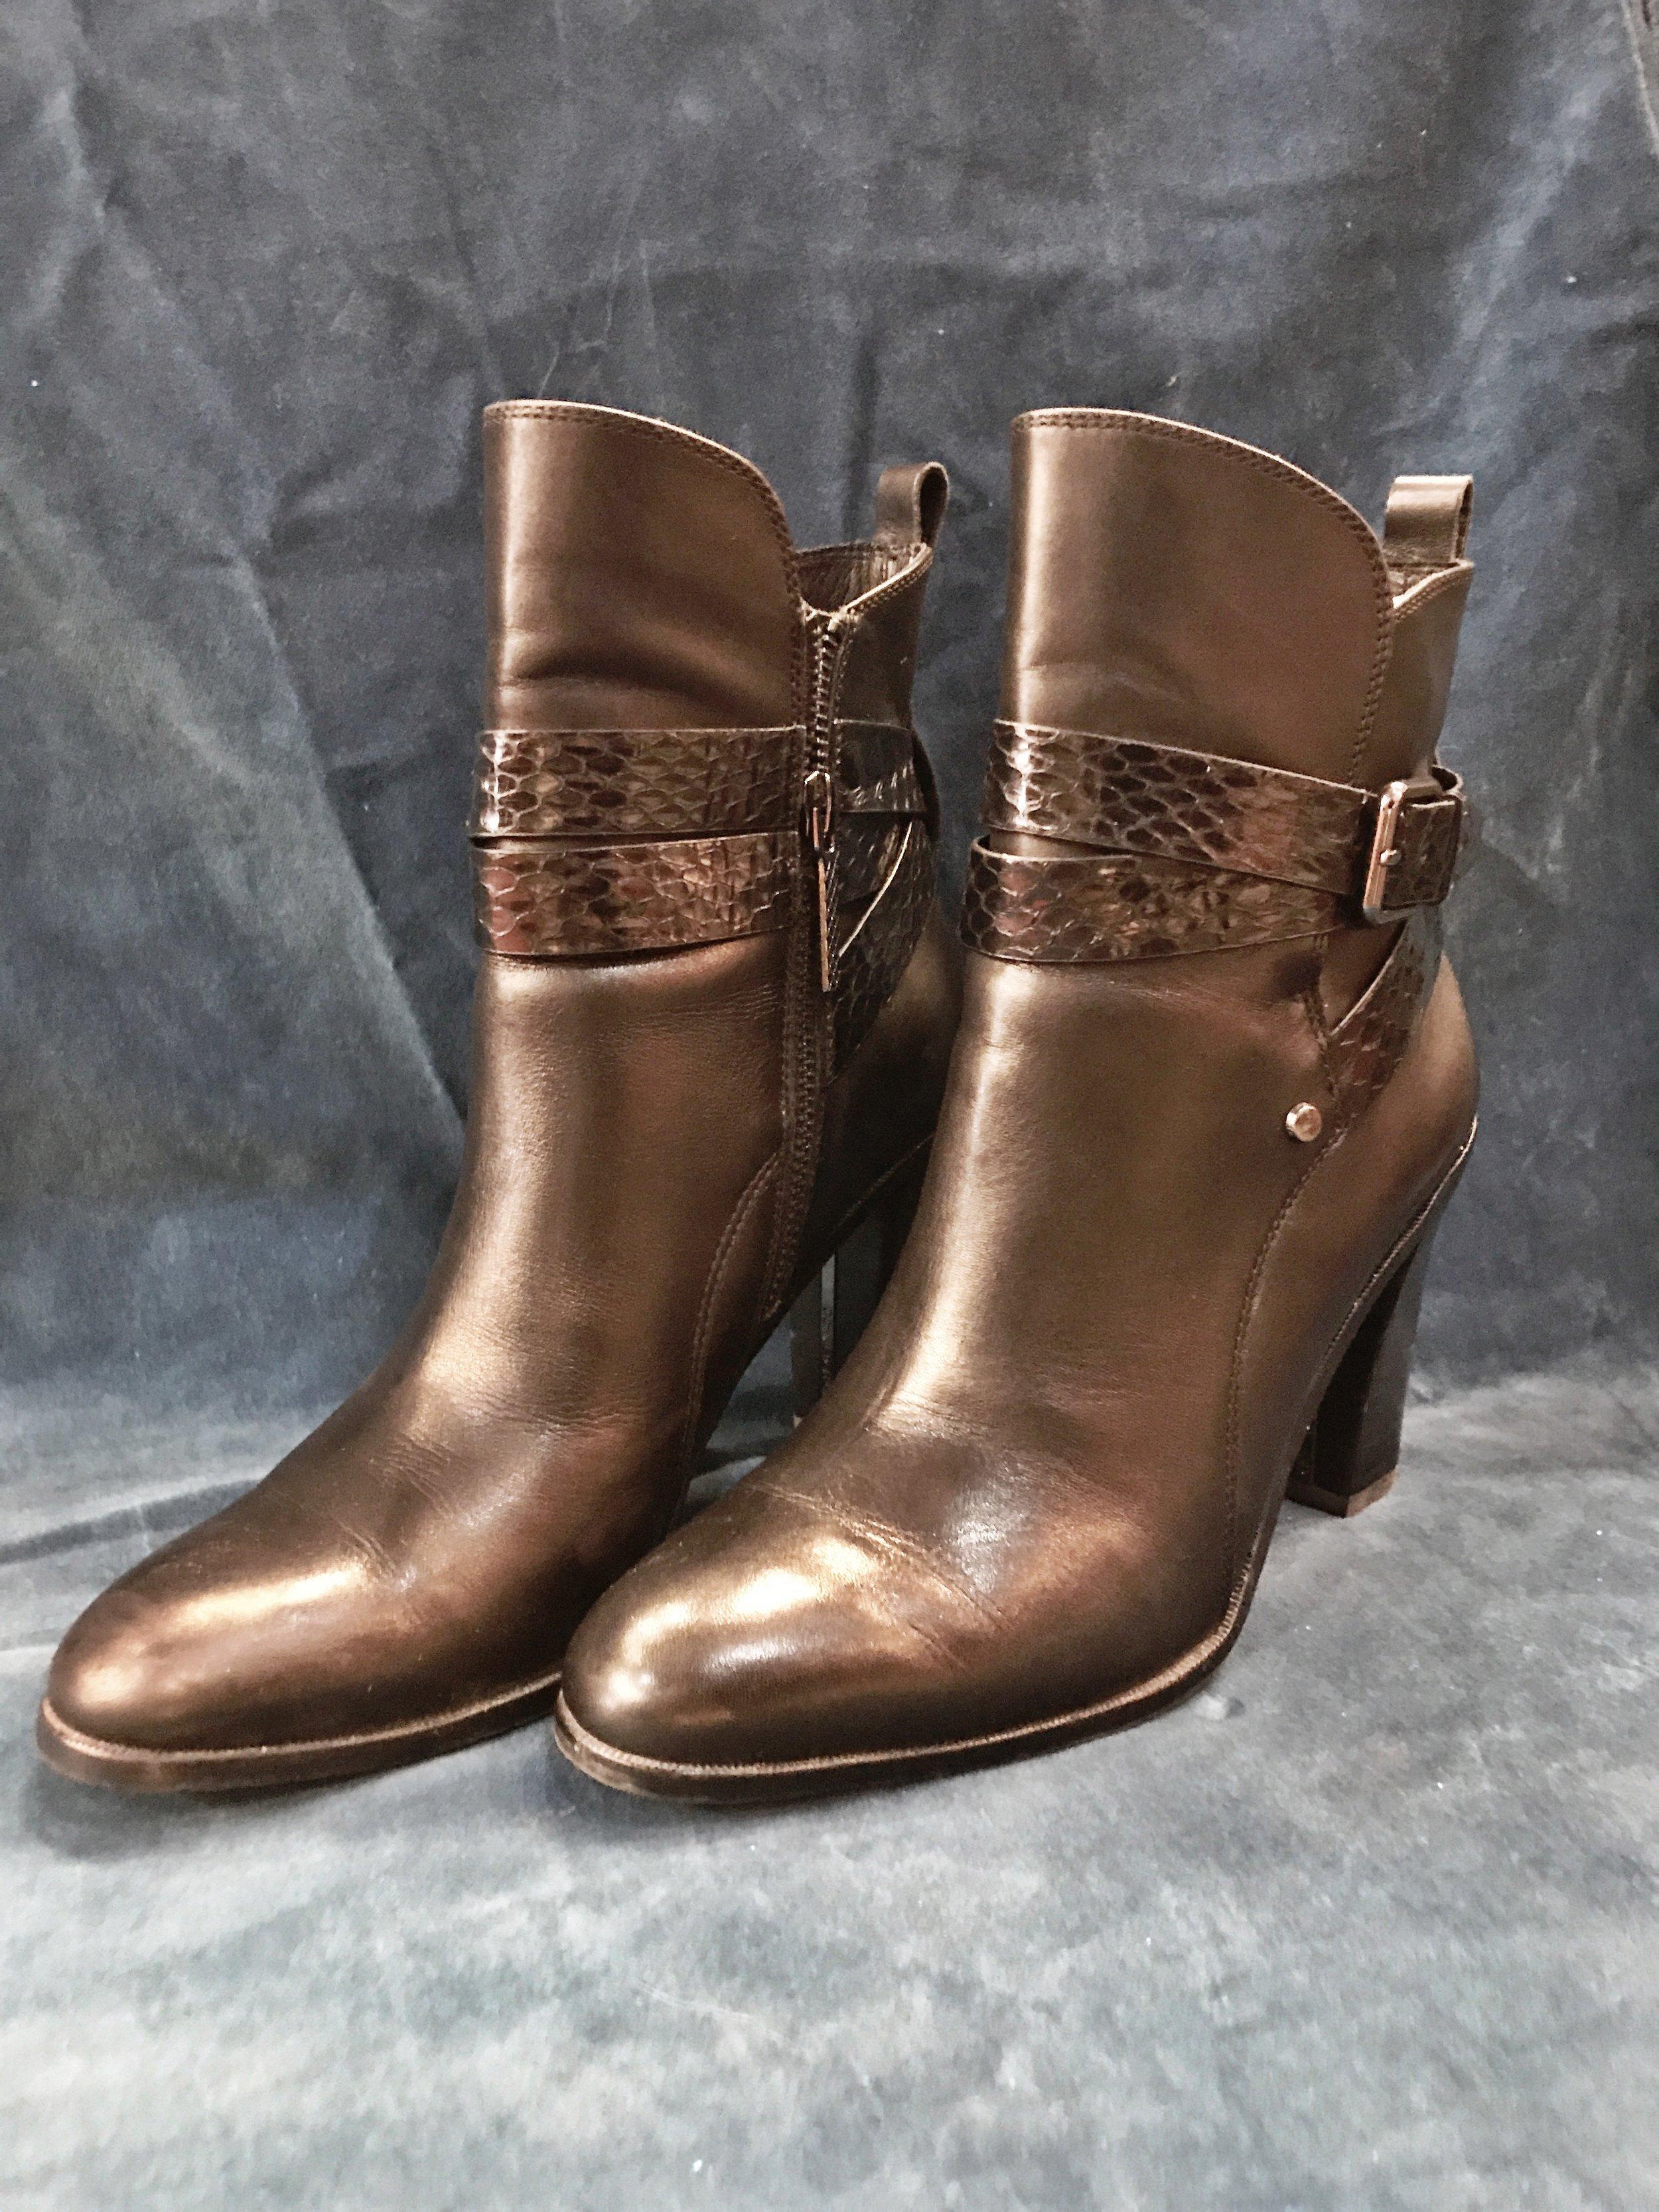 Donald J Pliner booties, $148 (originally $329), size 7.5